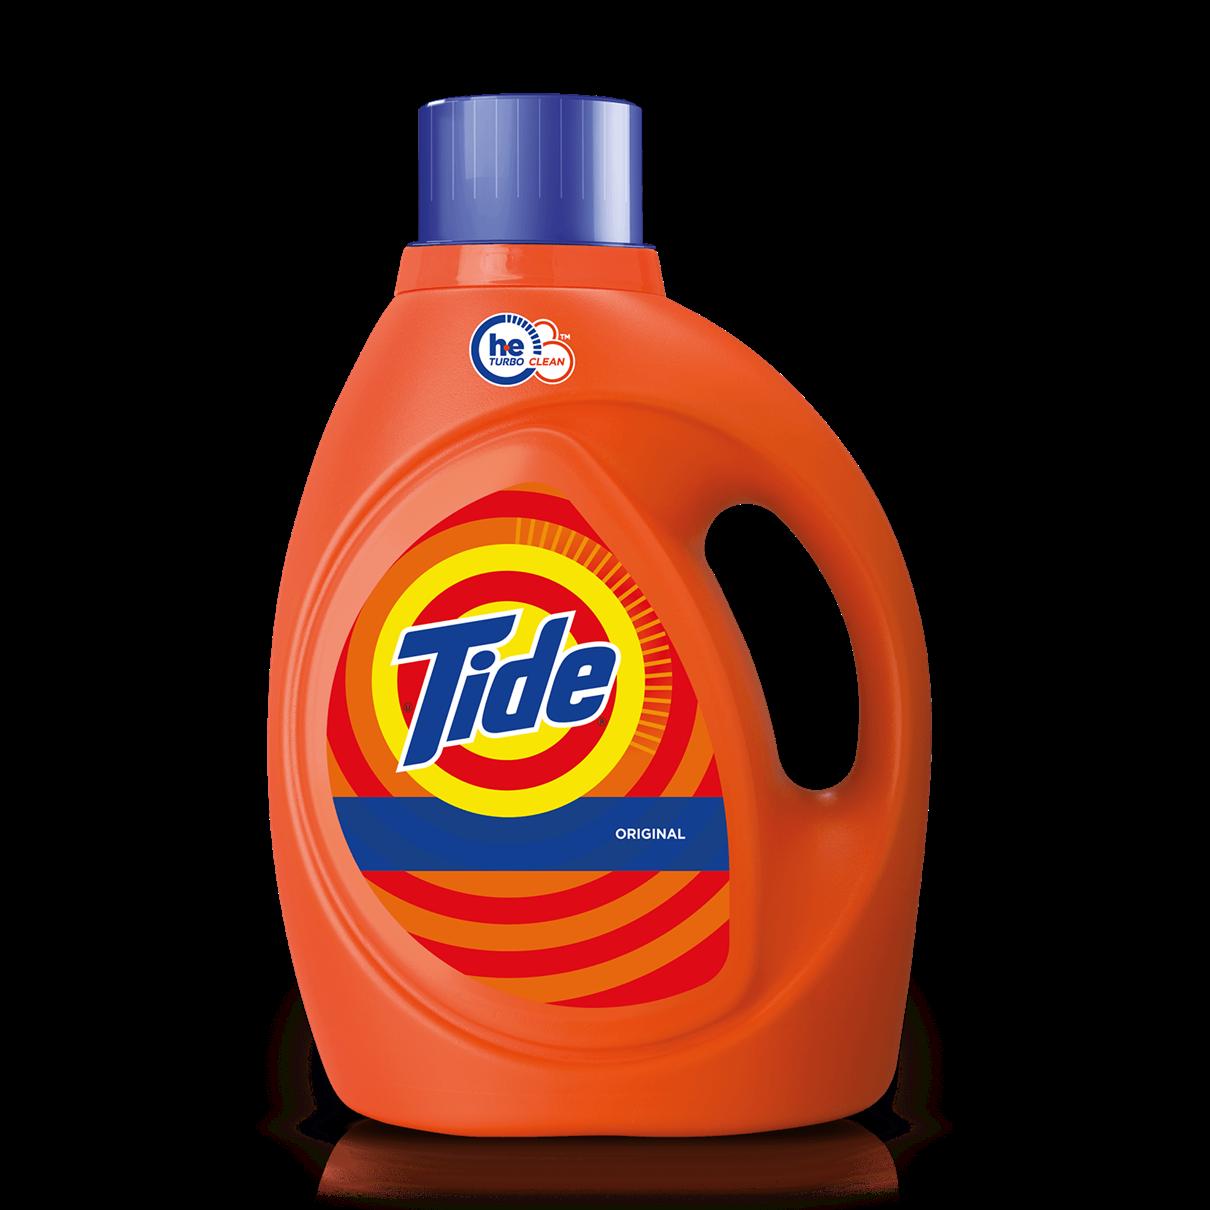 Tide Original Scent HE Turbo Clean Liquid Laundry Detergent